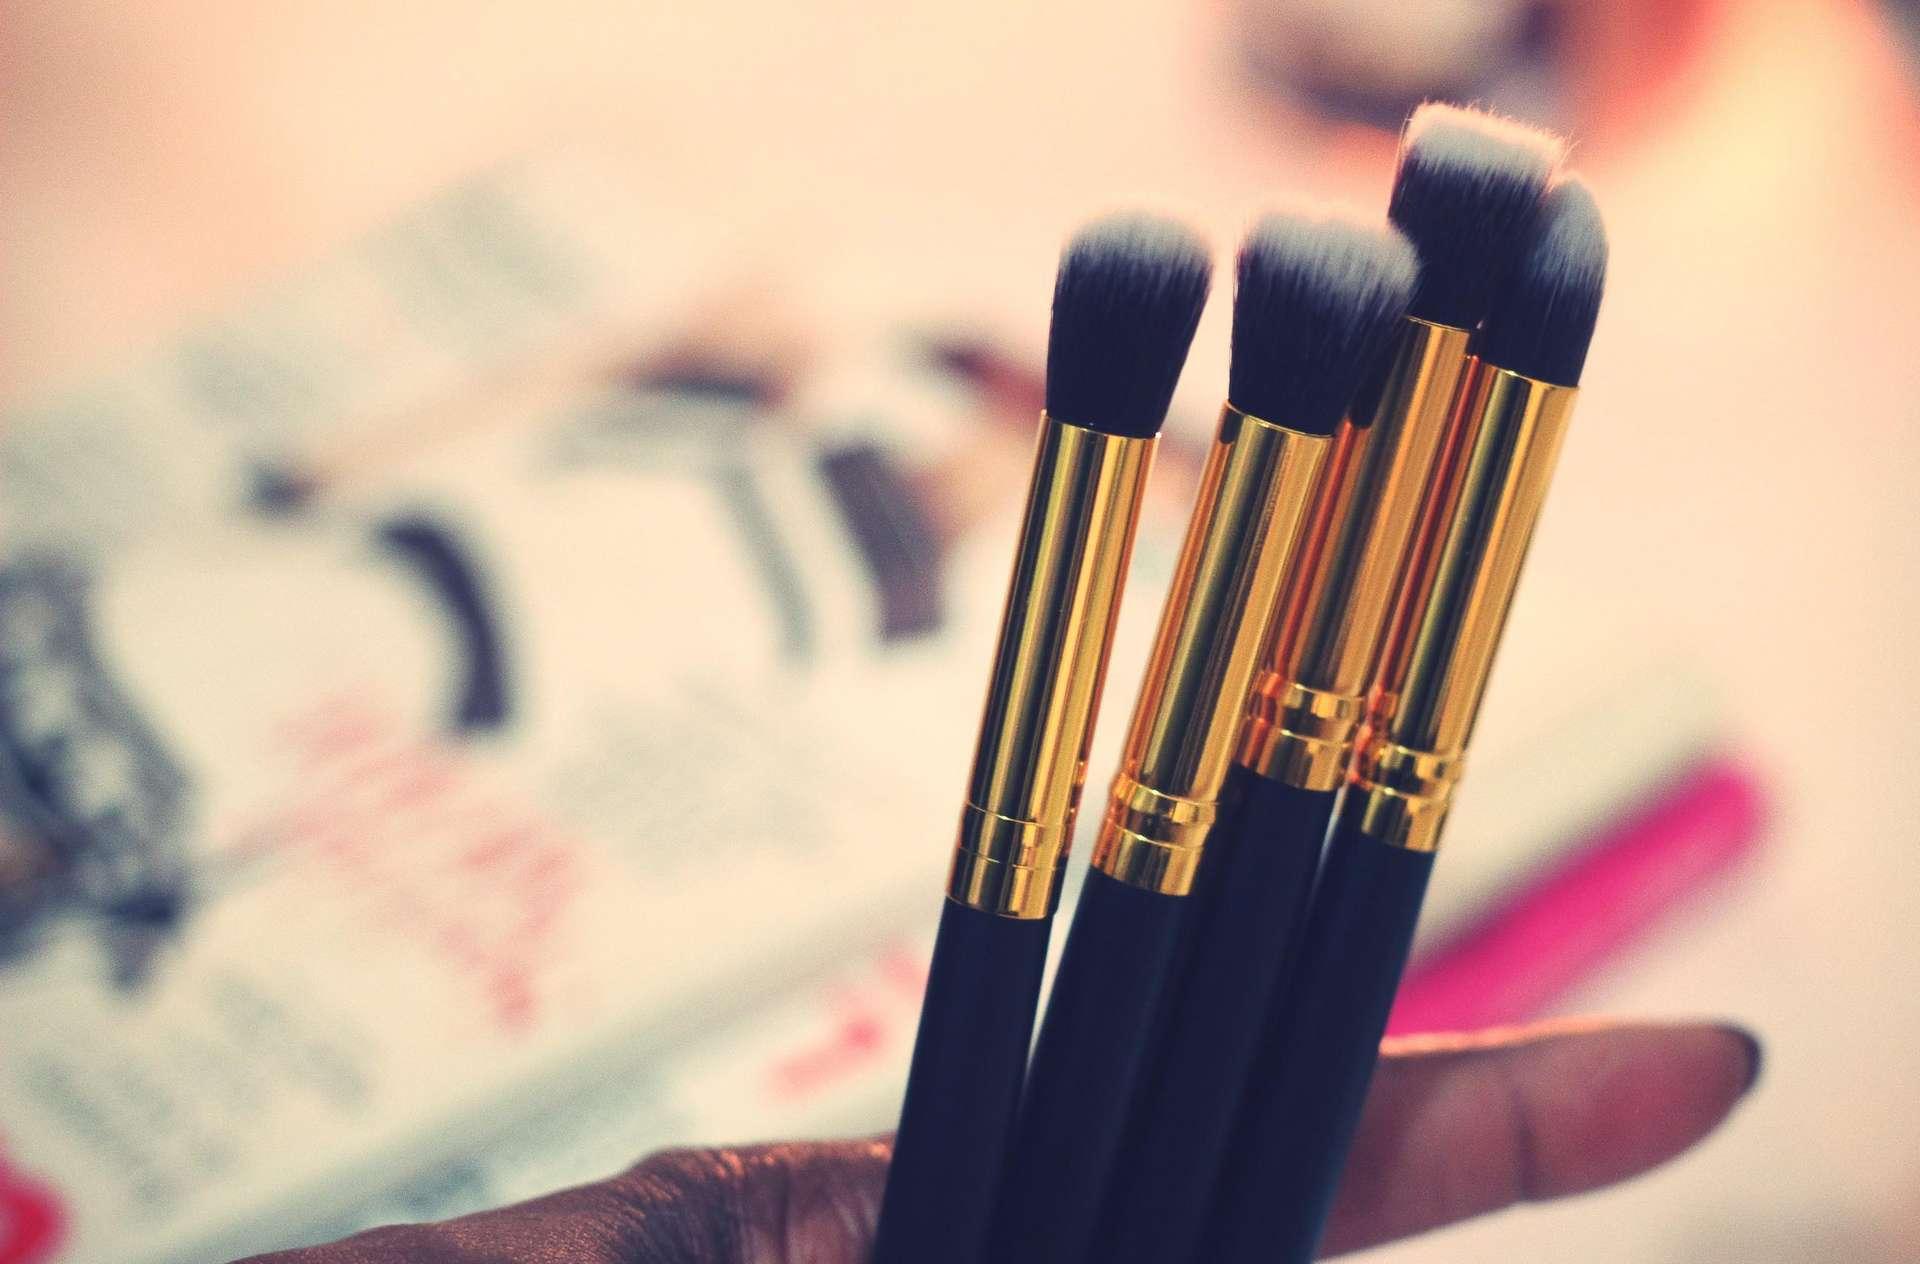 Make-up-brushes-facebrushes-eyebrushes-beauty-blackbeautyblogger-ctbb4